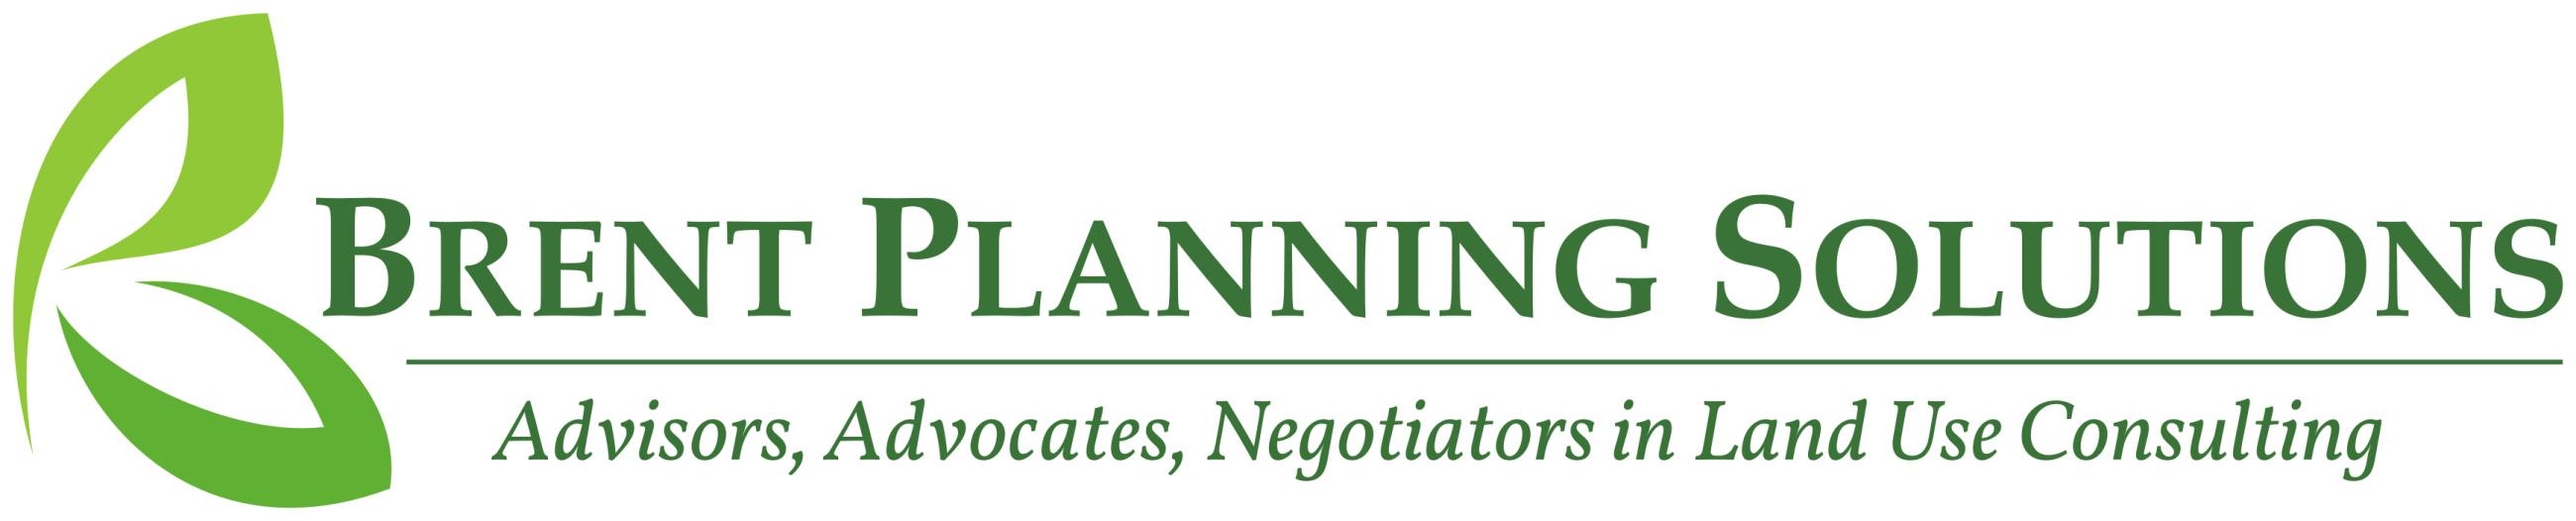 Brent Planning Solutions Logo